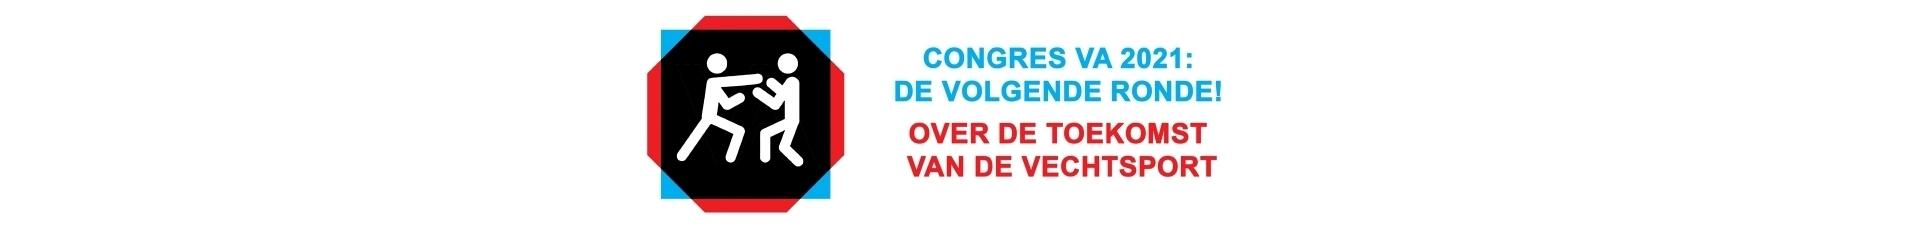 Congres VA 2021: De Volgende Ronde